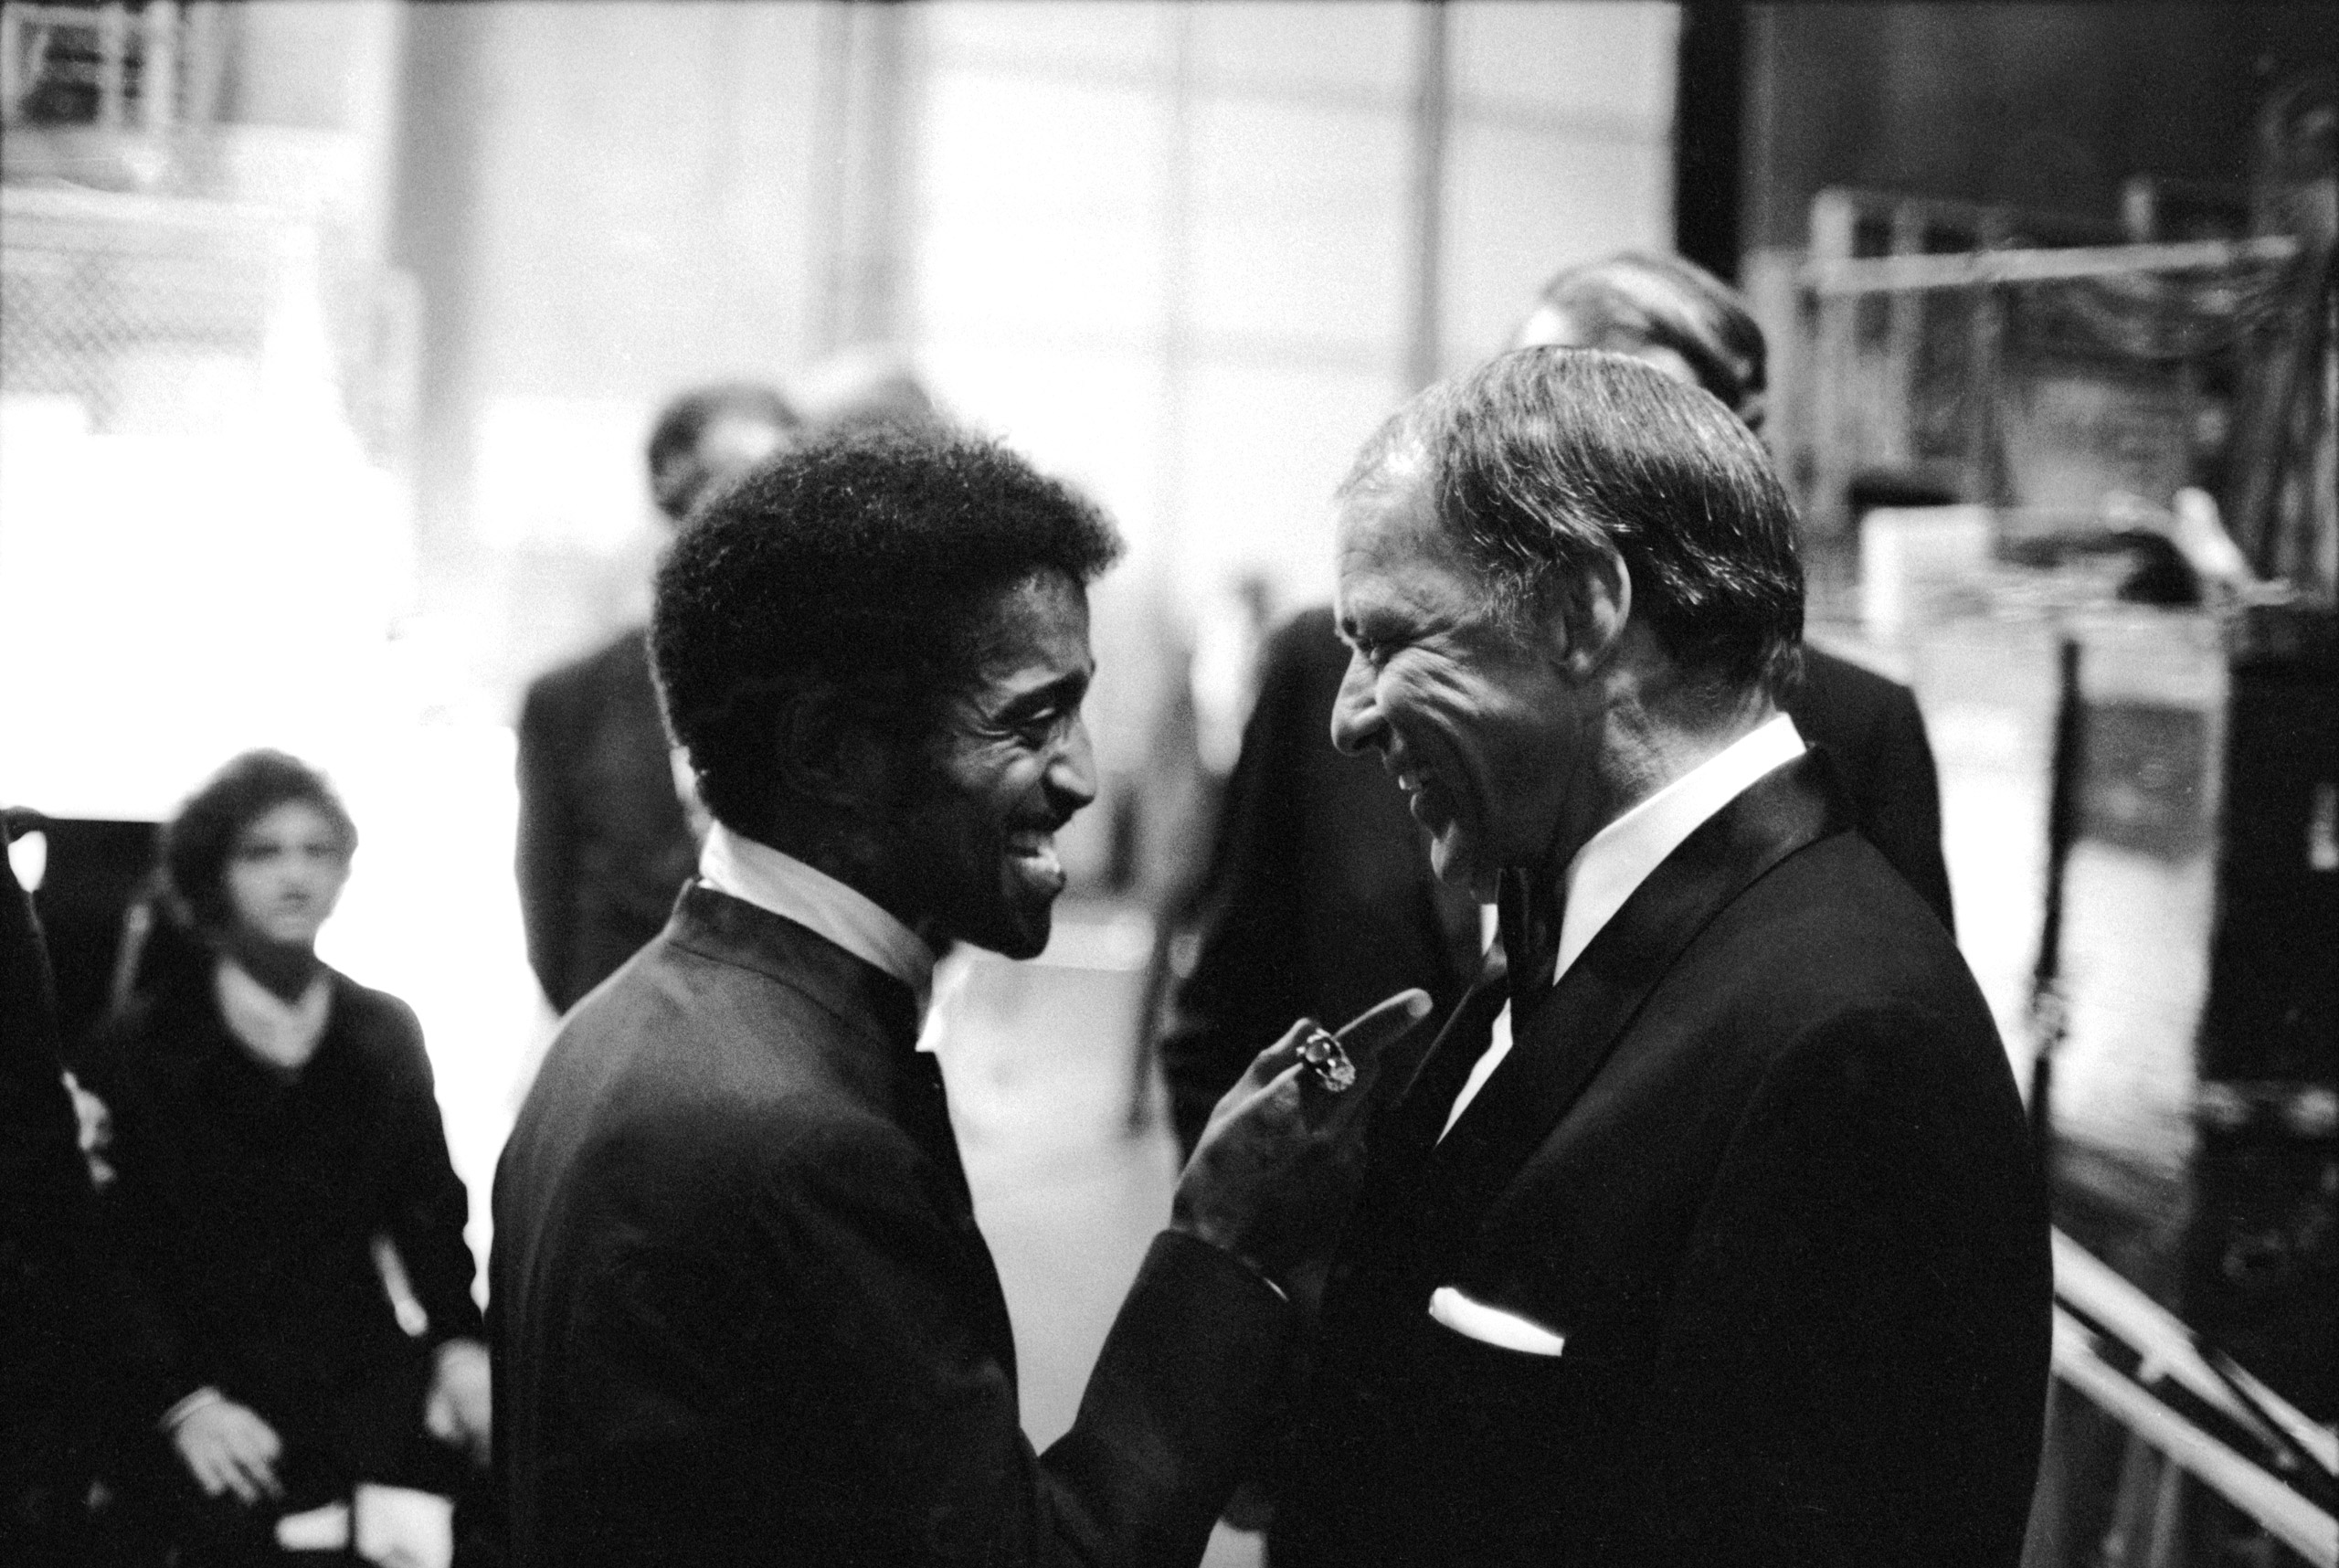 Sammy Davis Jr. talking with Sinatra at Sinatra's farewell performance, at UCLA, 1971.